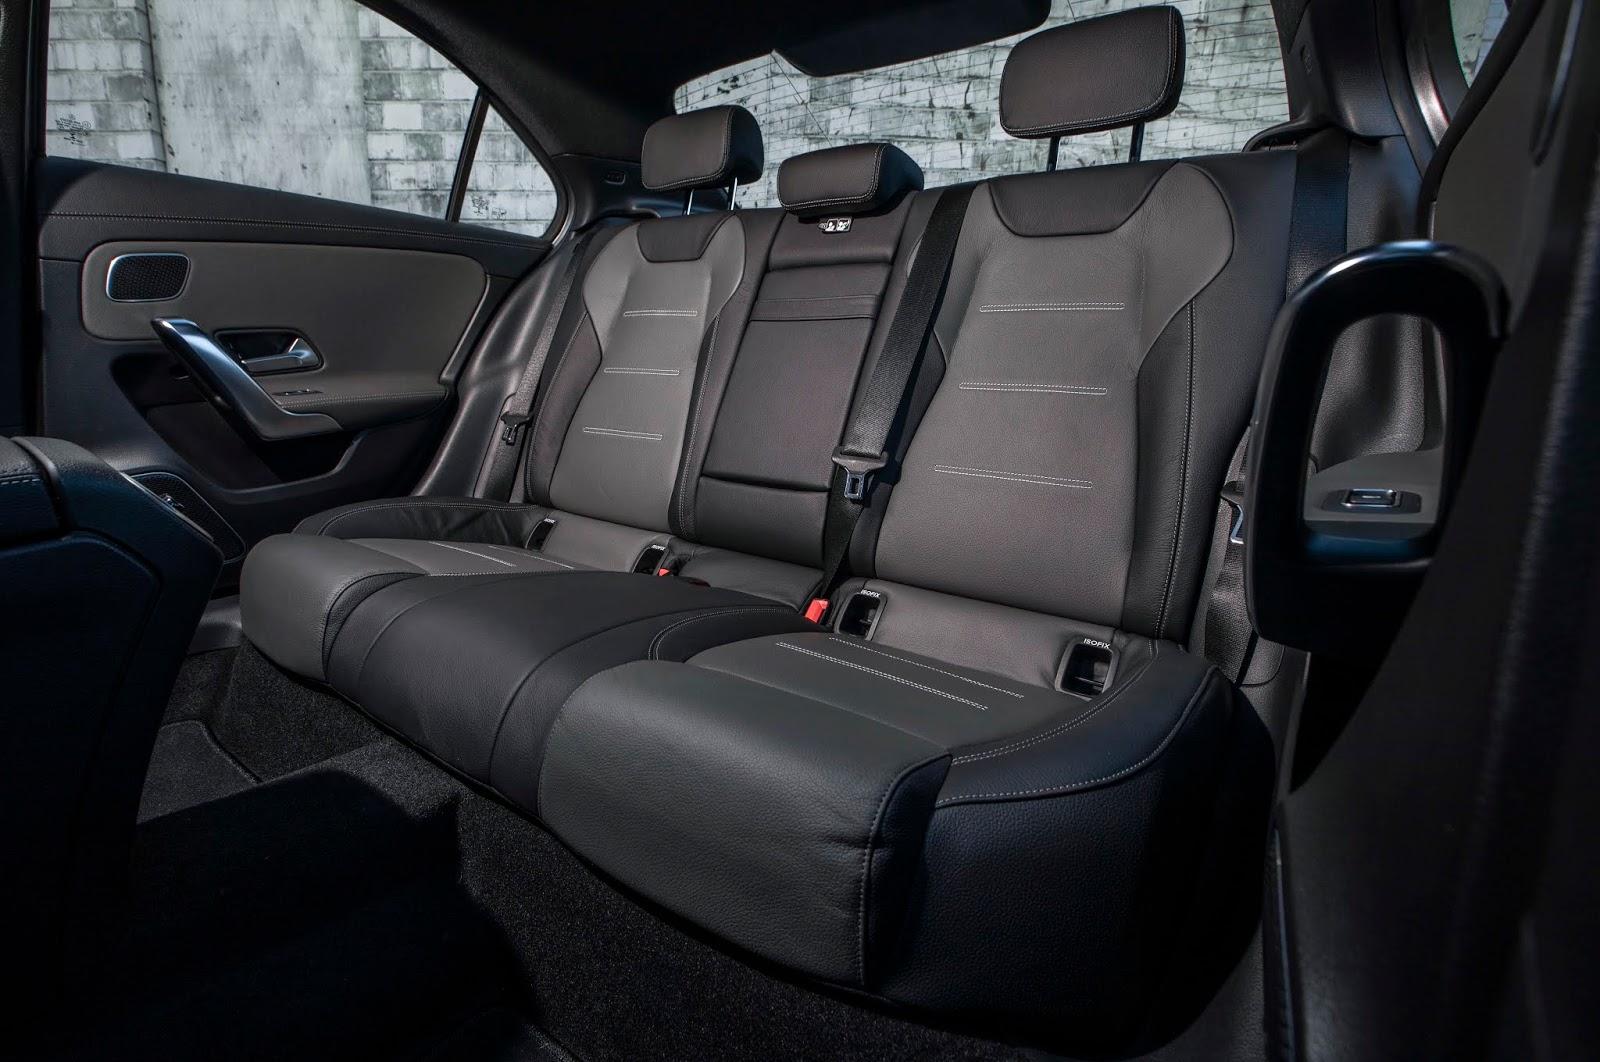 18C0777 024 Από 28.230 ευρώ η τιμή της Mercedes A-Class Sedan Luxury sedan, Mercedes, Mercedes AMG, premium sedan, sedan, zblog, καινούργιο, καινούρια, τιμες